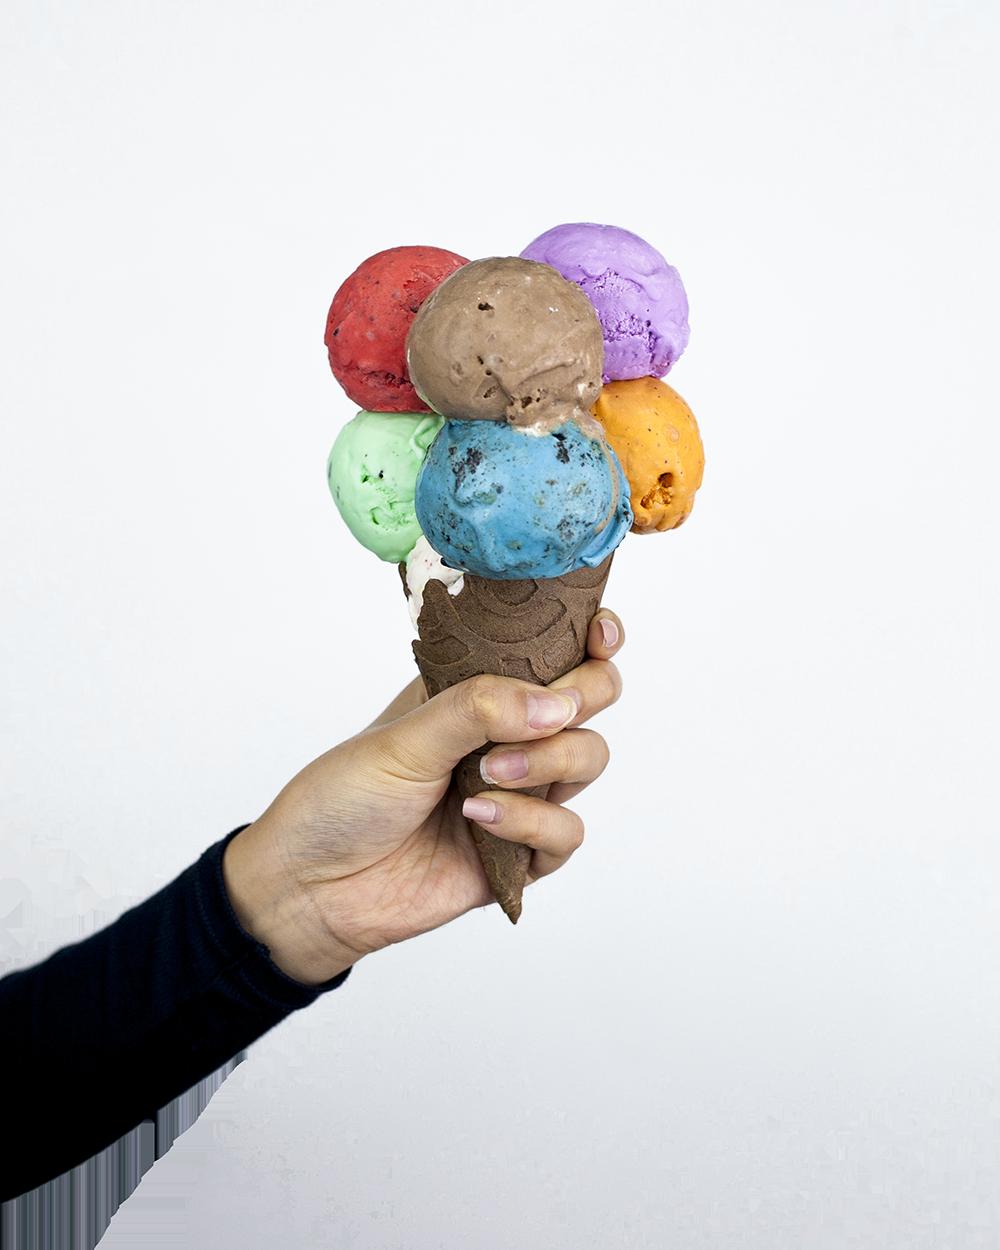 Stuffed Ice Cream 7 Scoops Bouquet